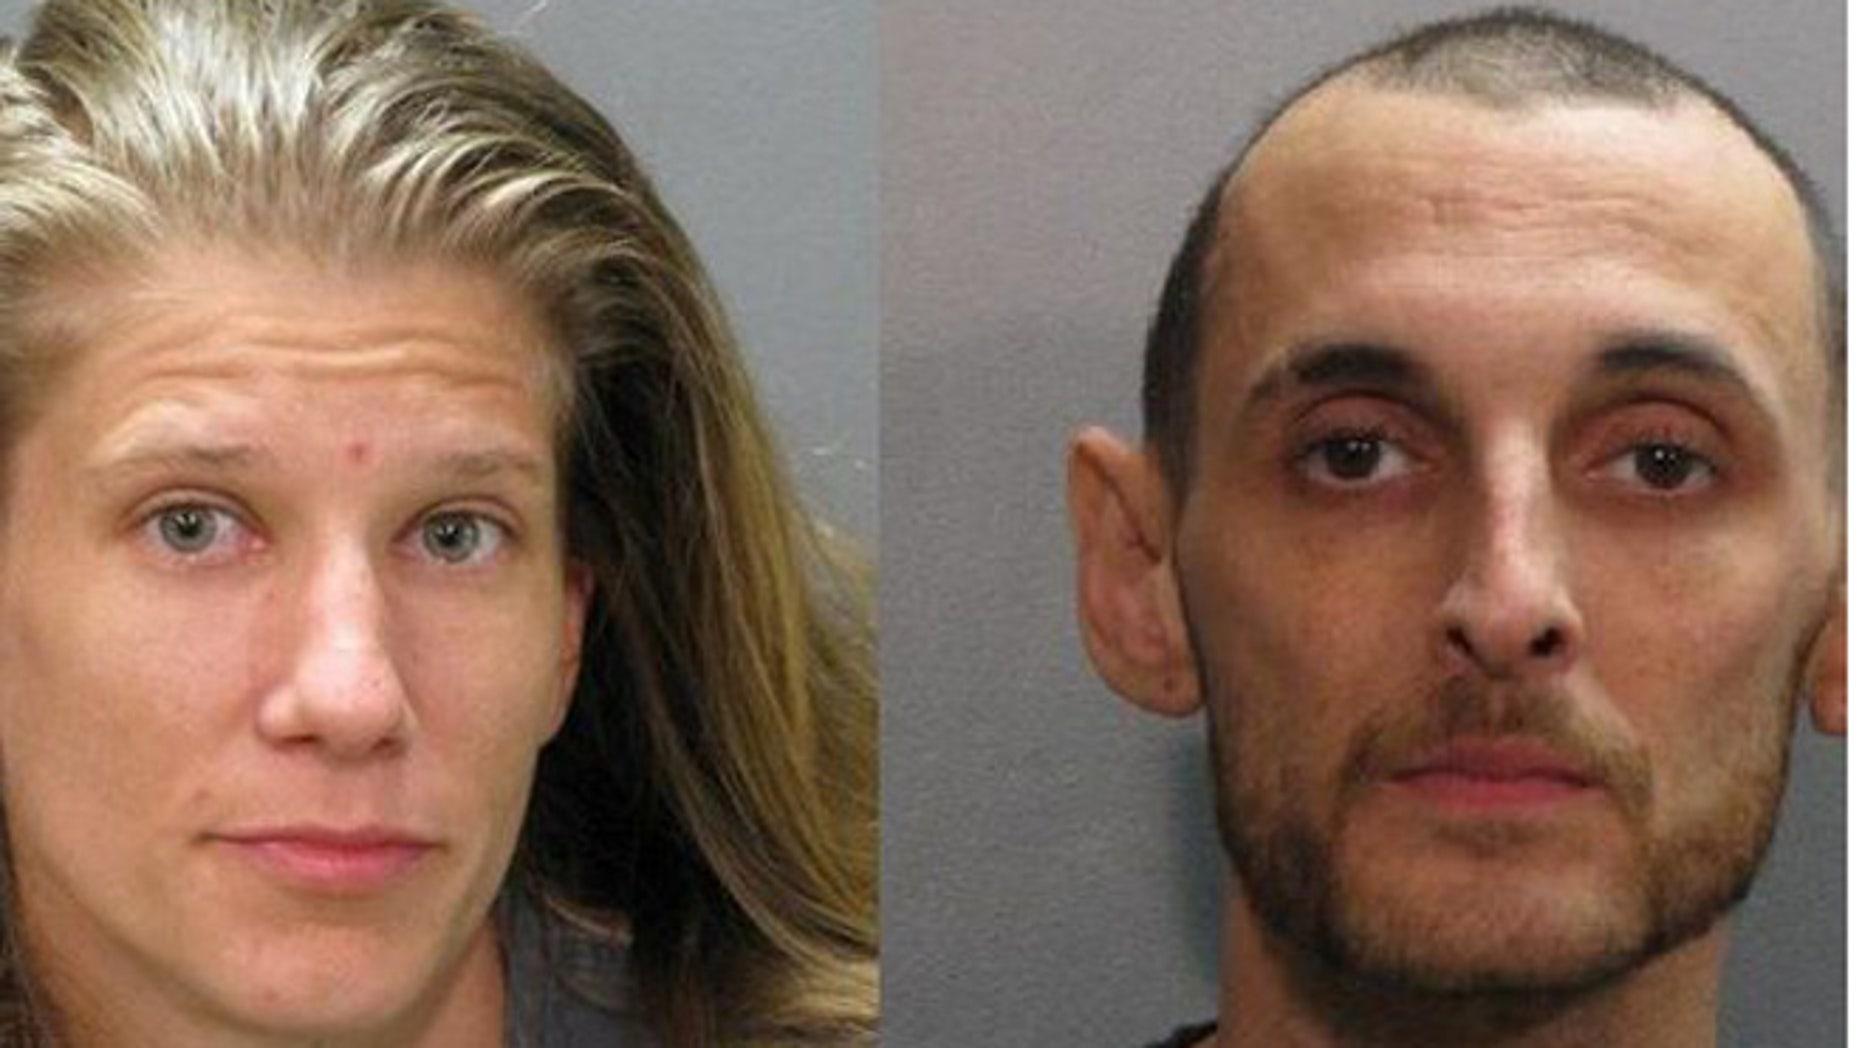 Photos of Leanne Hunn and Ryan Bautista.(Jacksonville Sheriff's Office)